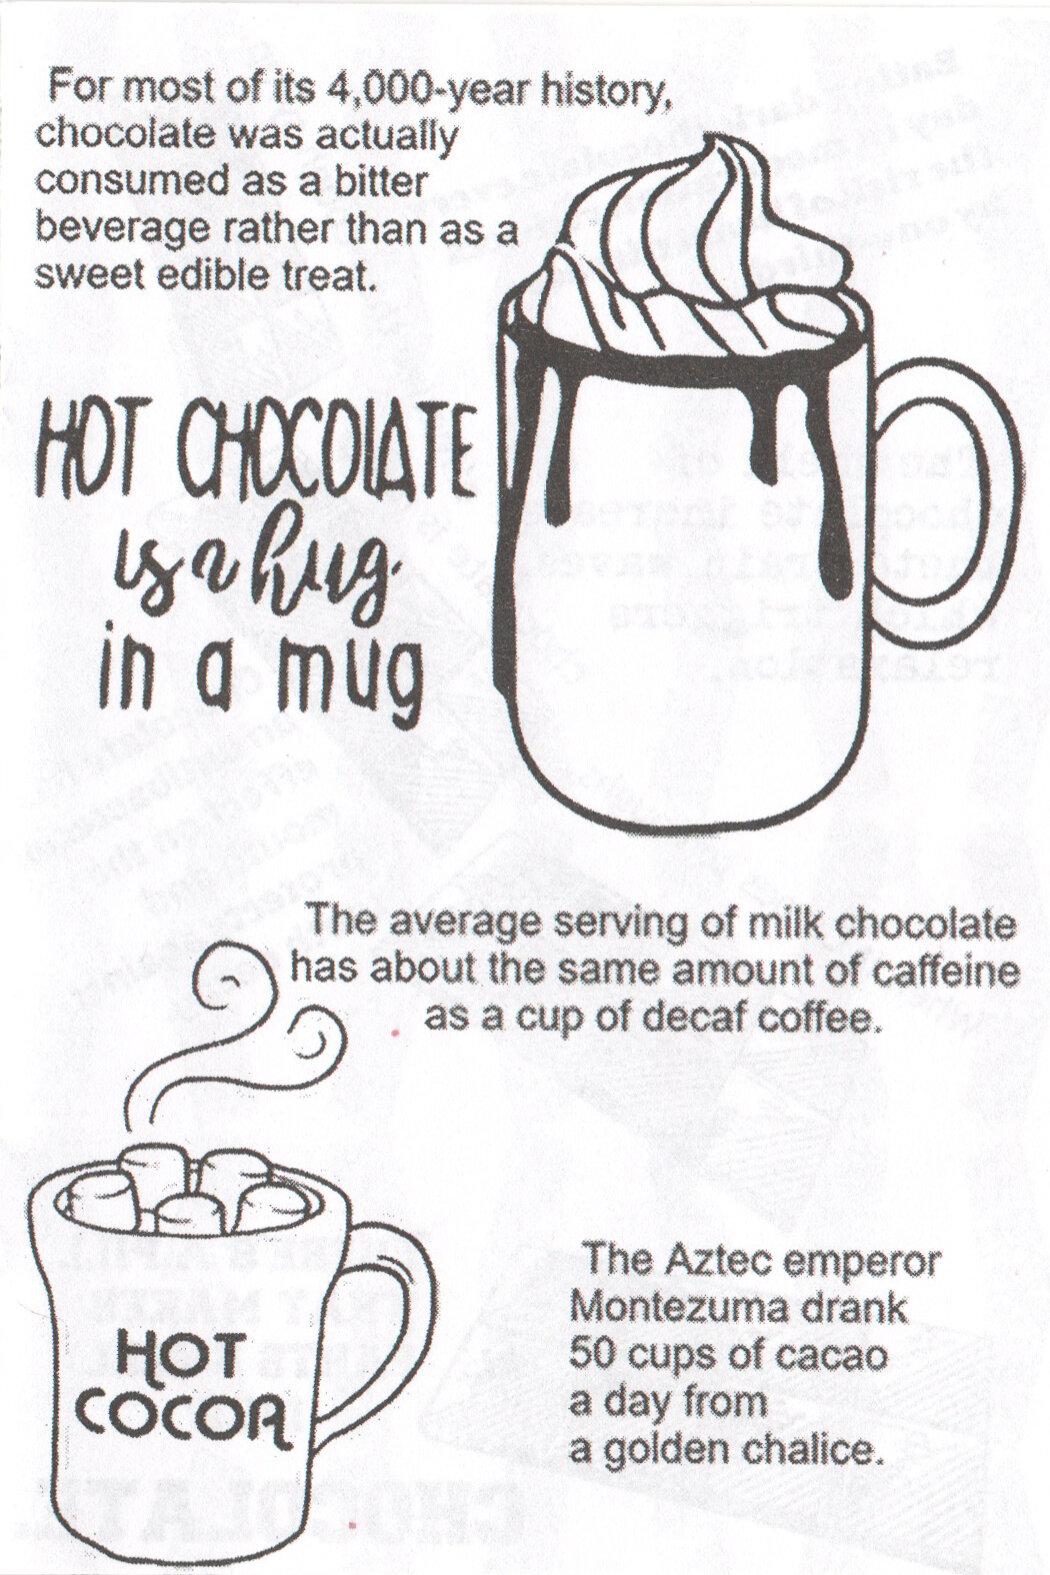 Chocolate_Page_3_Image_0001.jpg